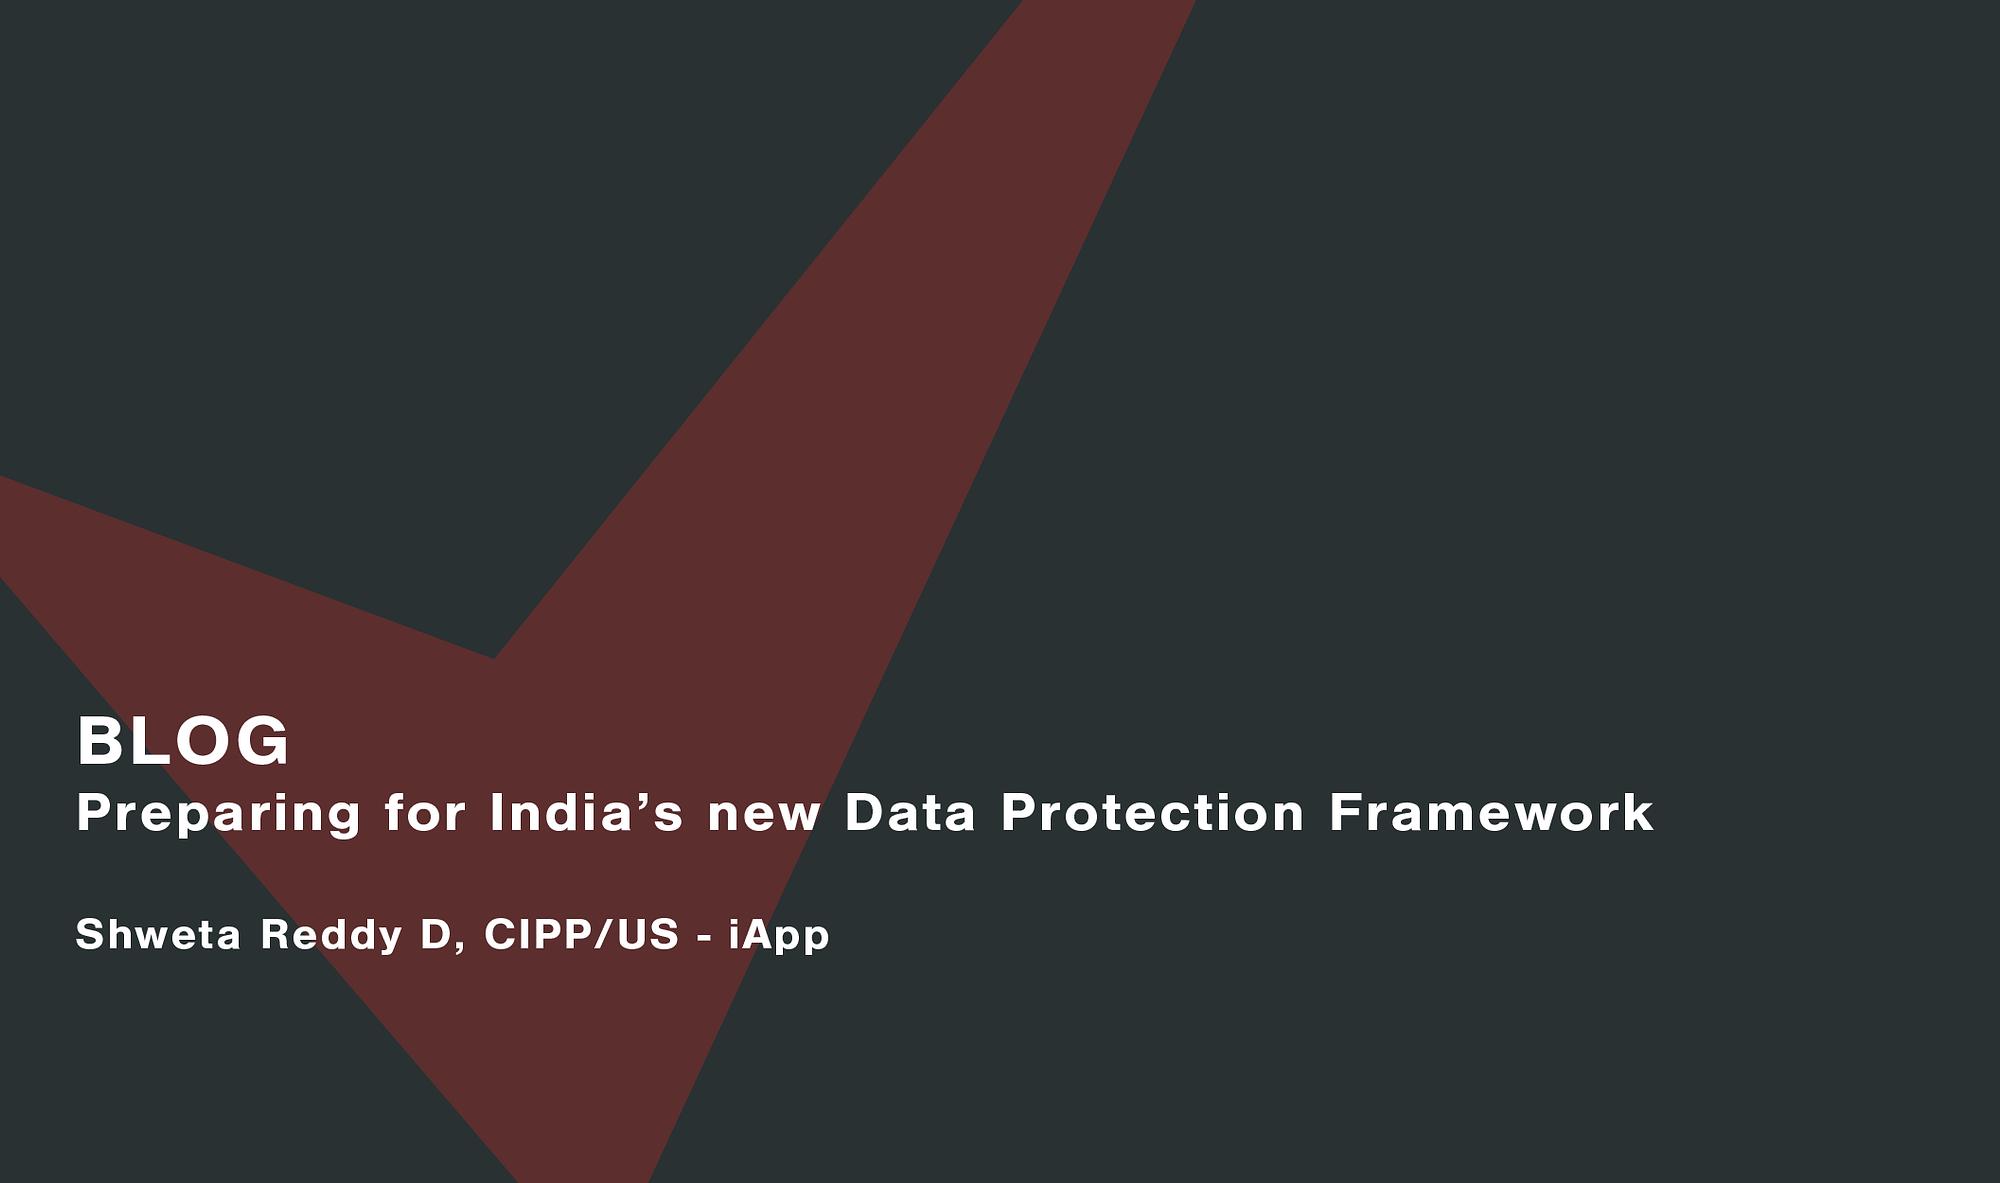 Preparing-for-Indias-new-Data-Protection-Framework